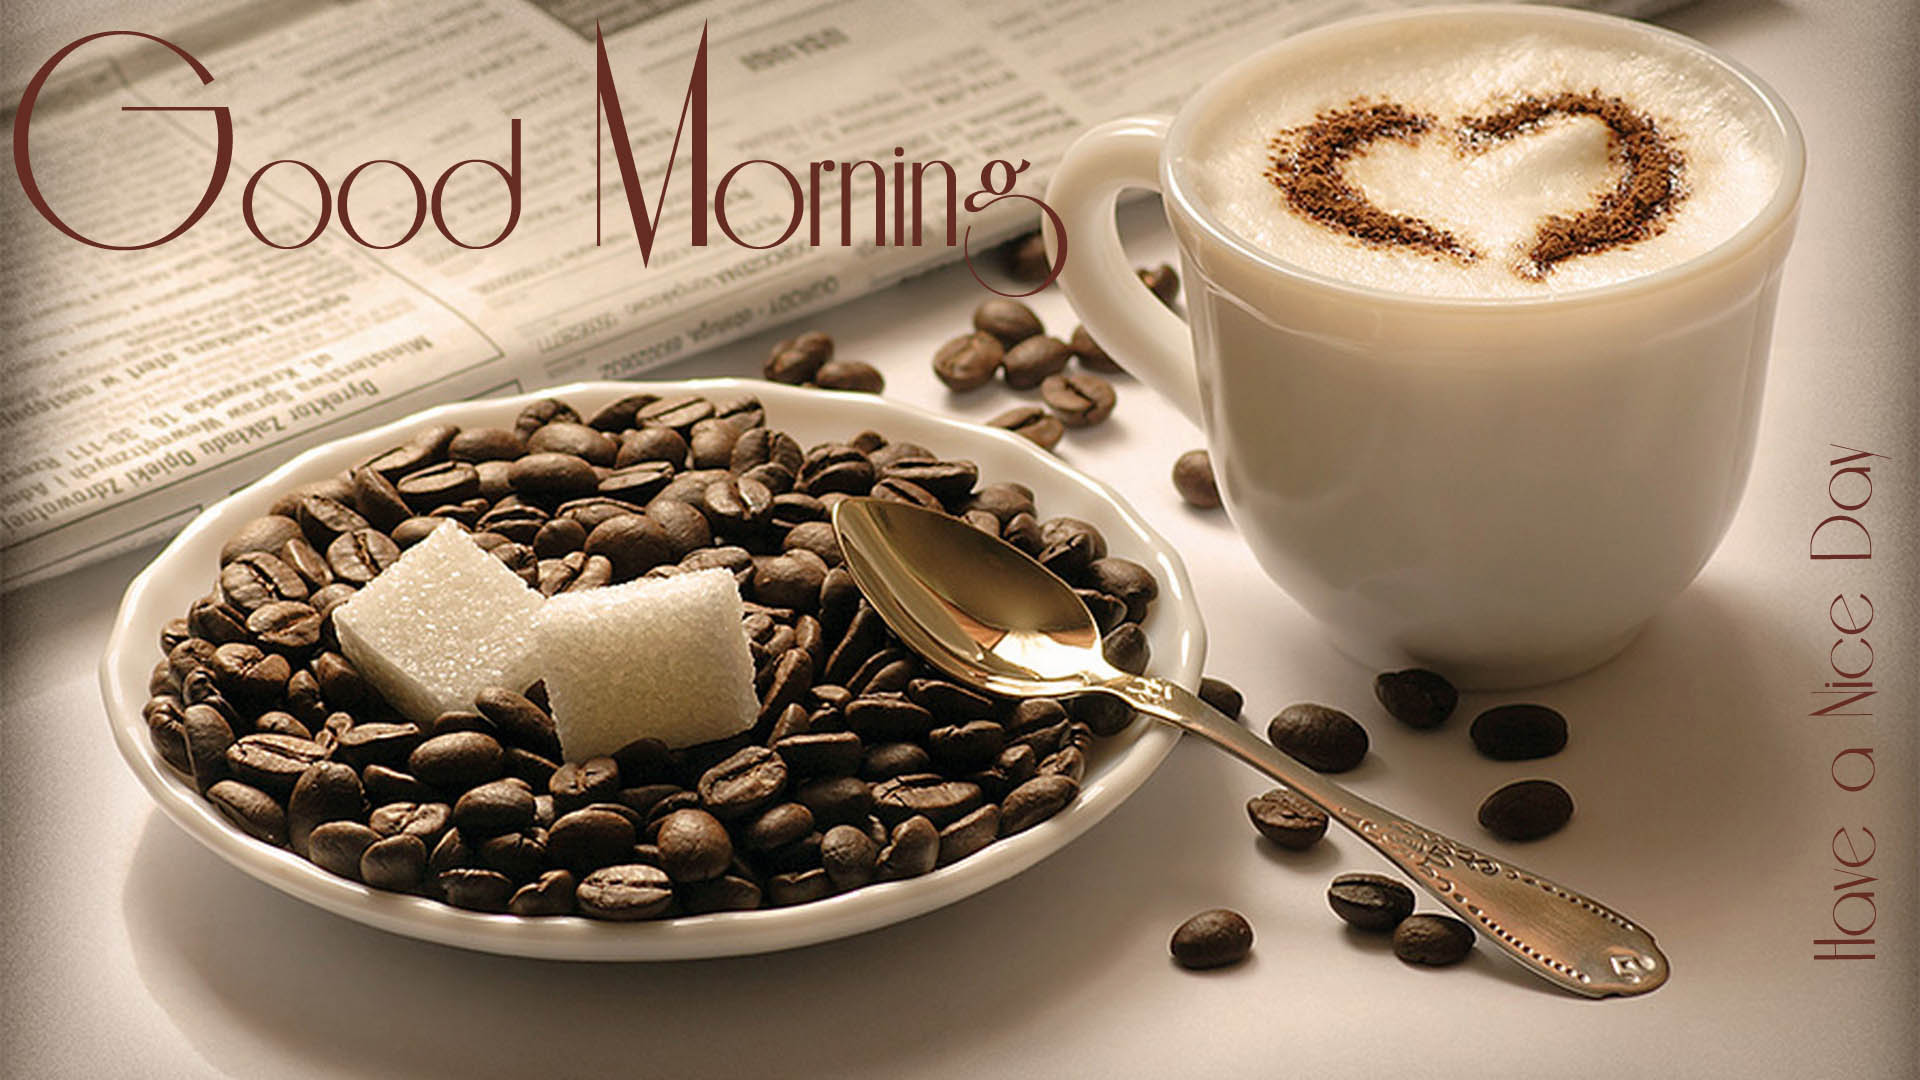 Good Morning Wallpaper HD images